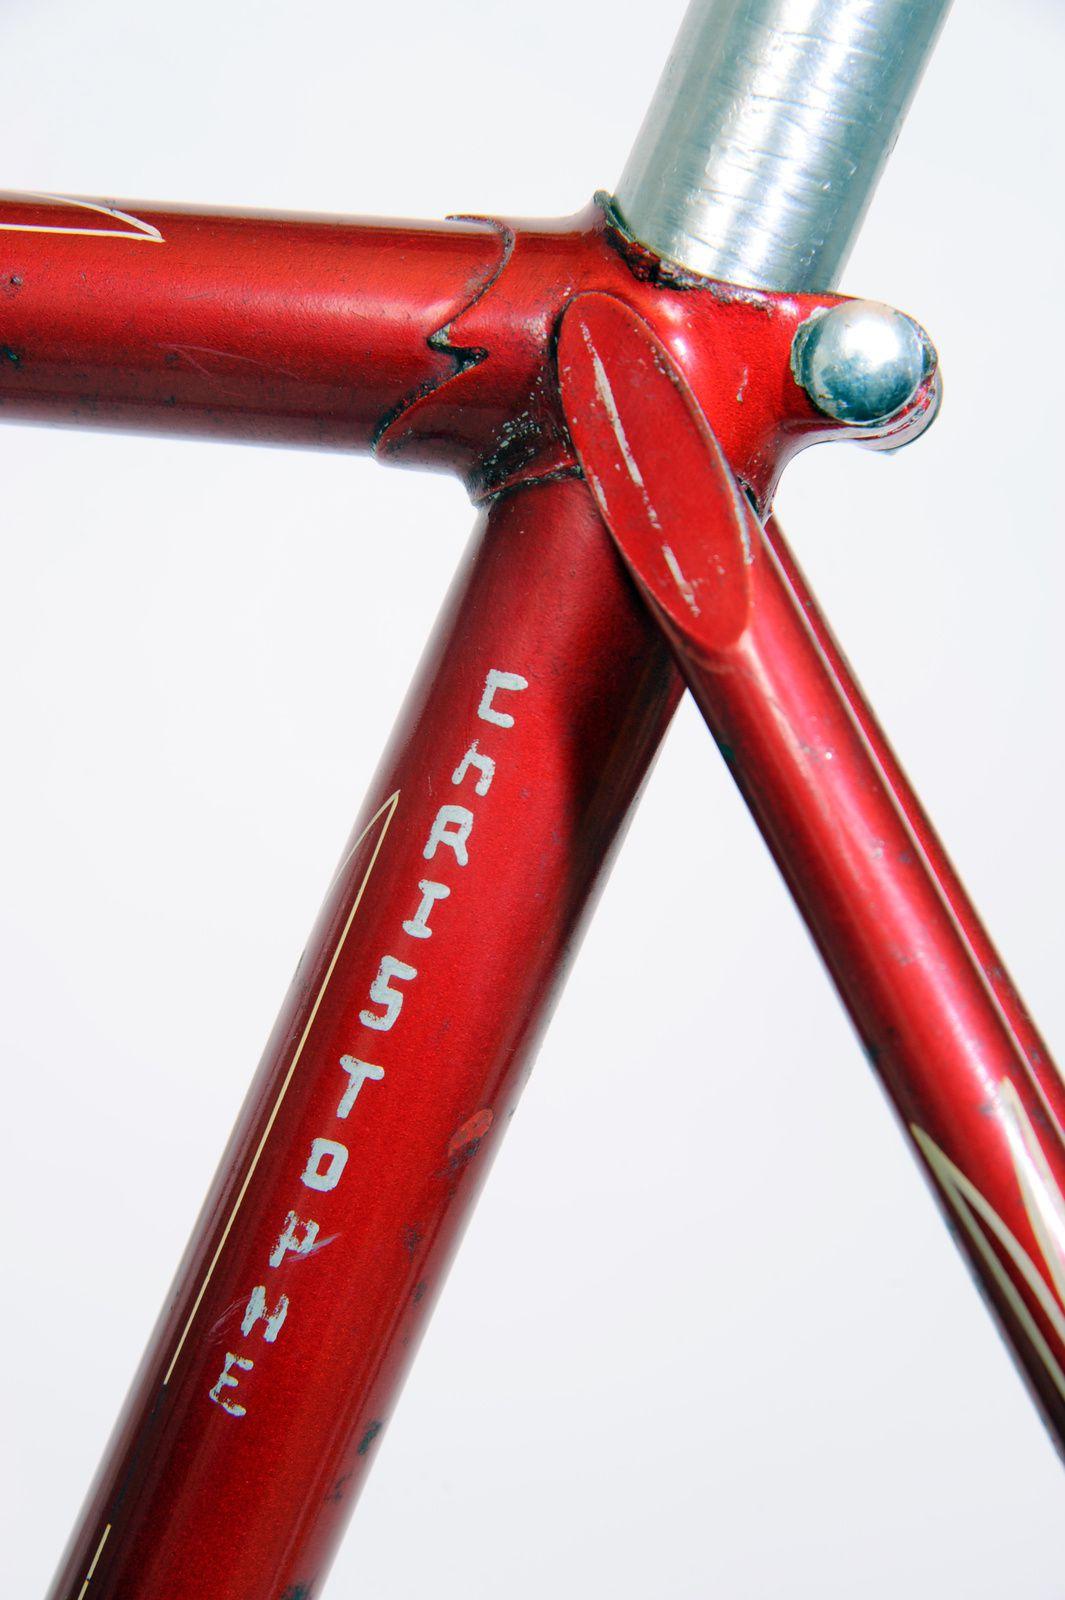 Vélo de piste La Perle 1953.